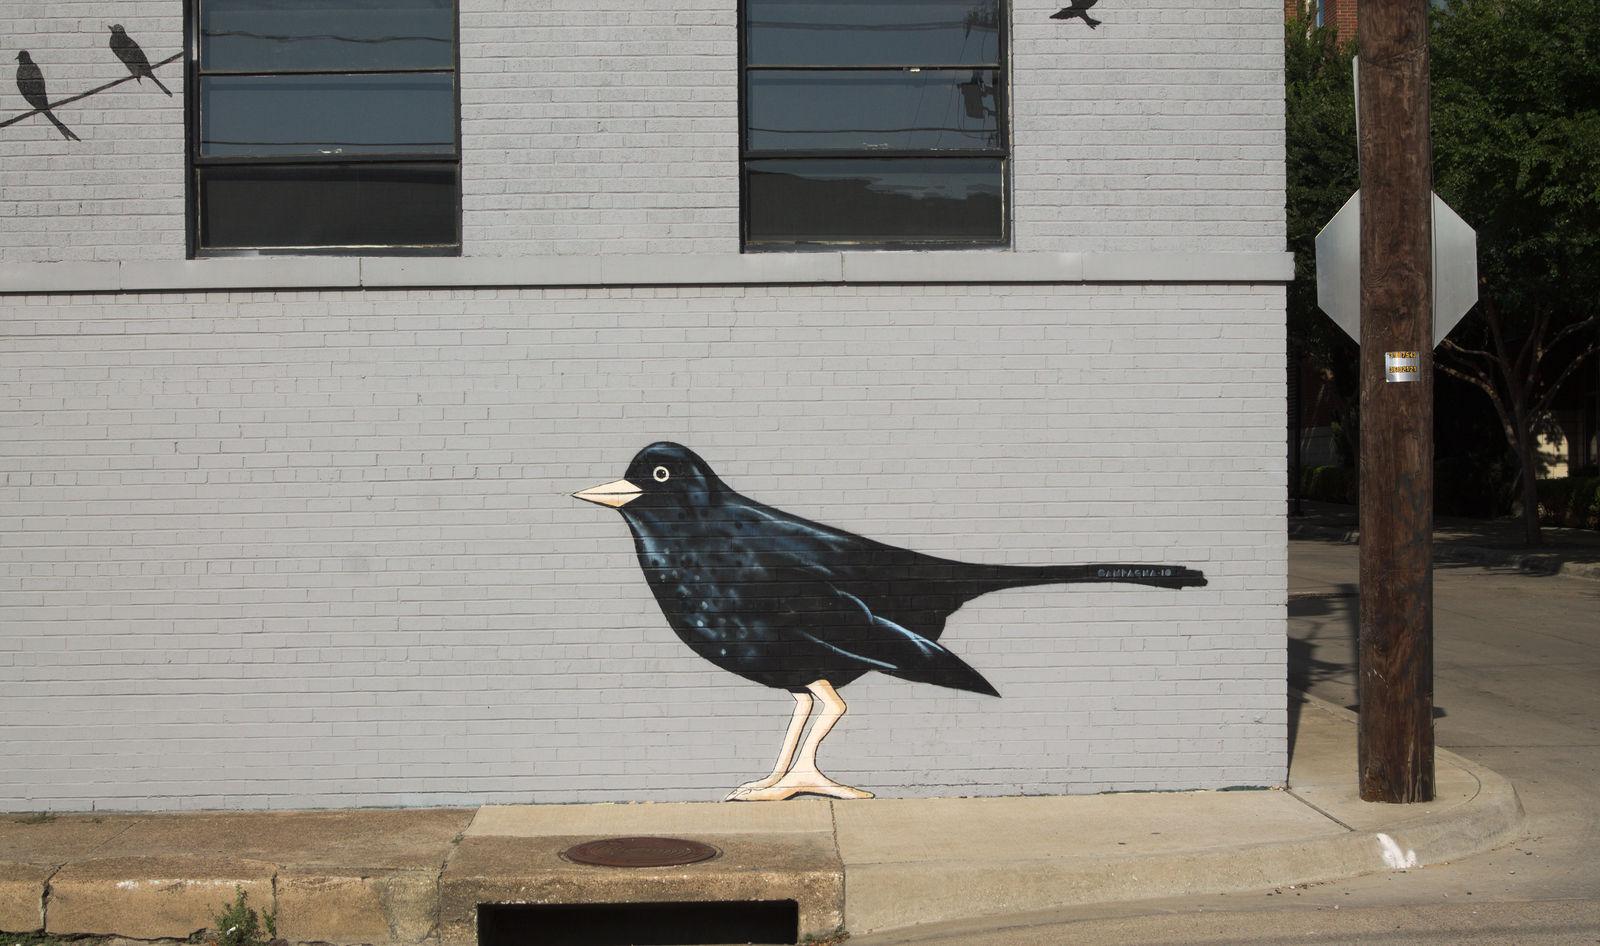 Put a bird on it by DeepSlackerJazz